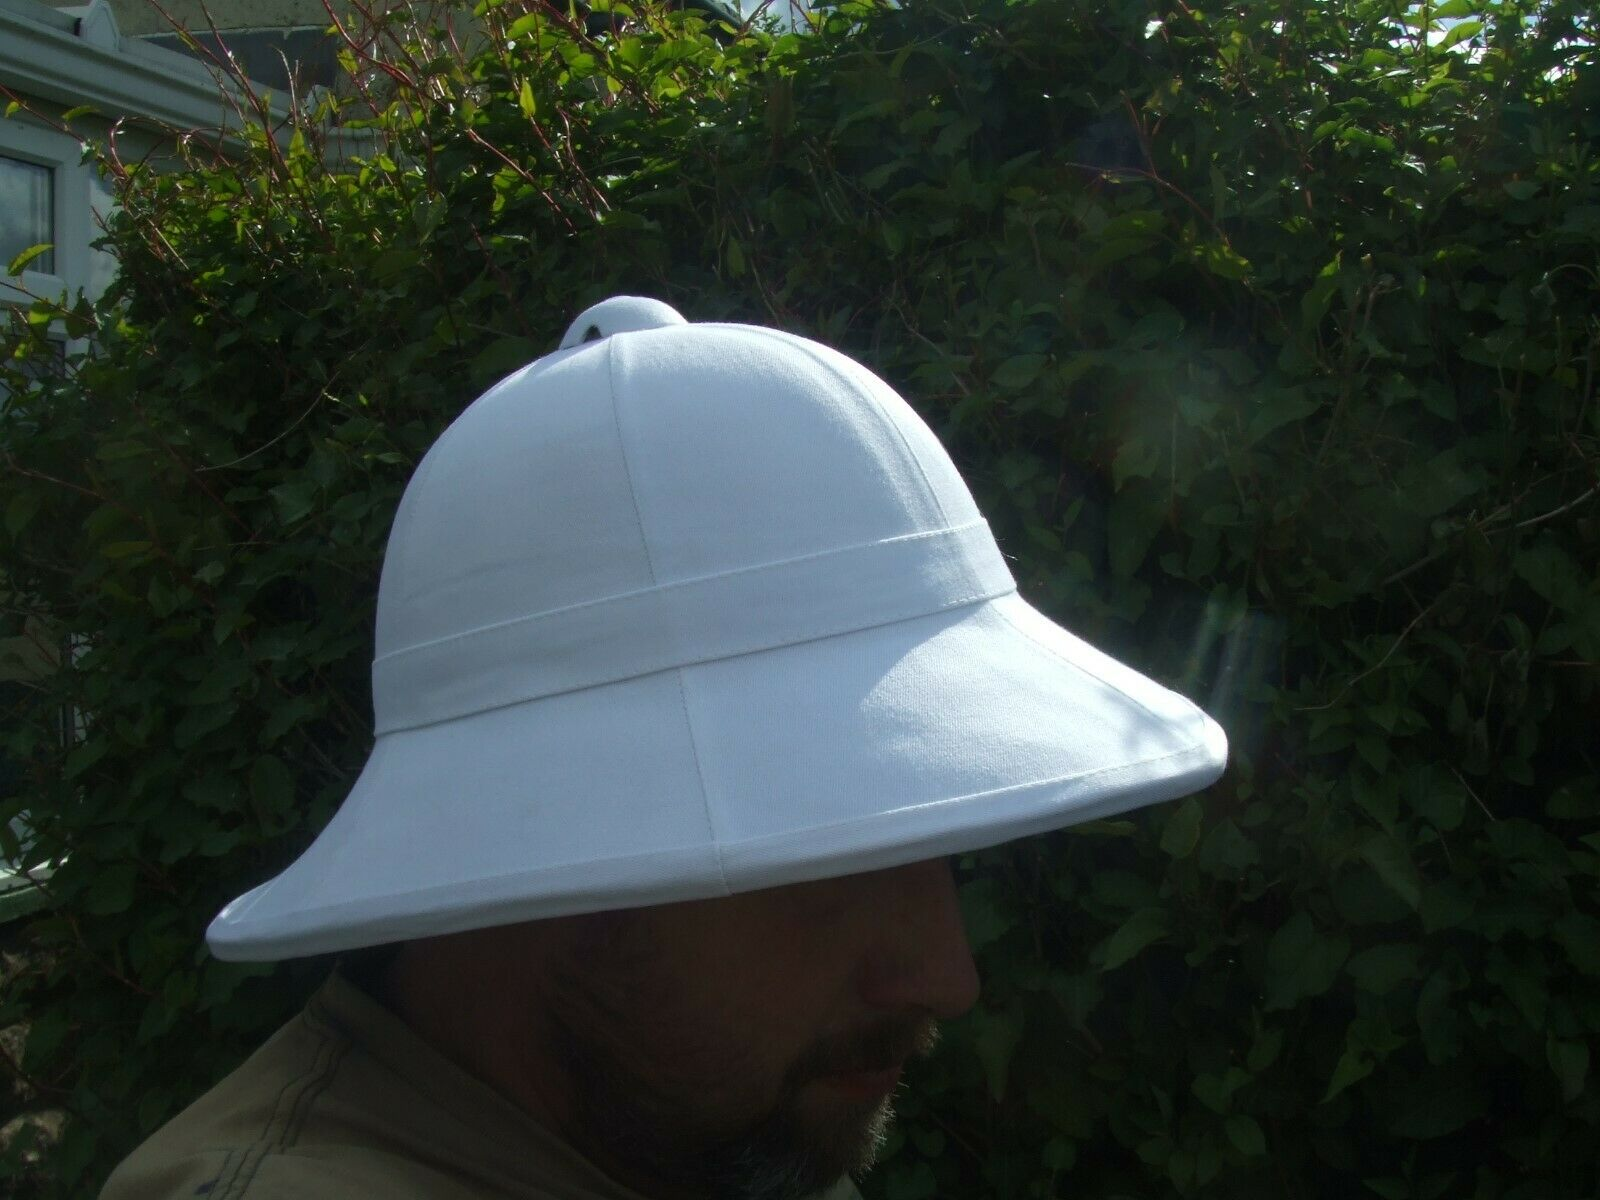 REPLICA WOLSELEY WHITE COLONIAL PITH HELMET SUN SAFARI HAT - ARMY SOLA TOPEE